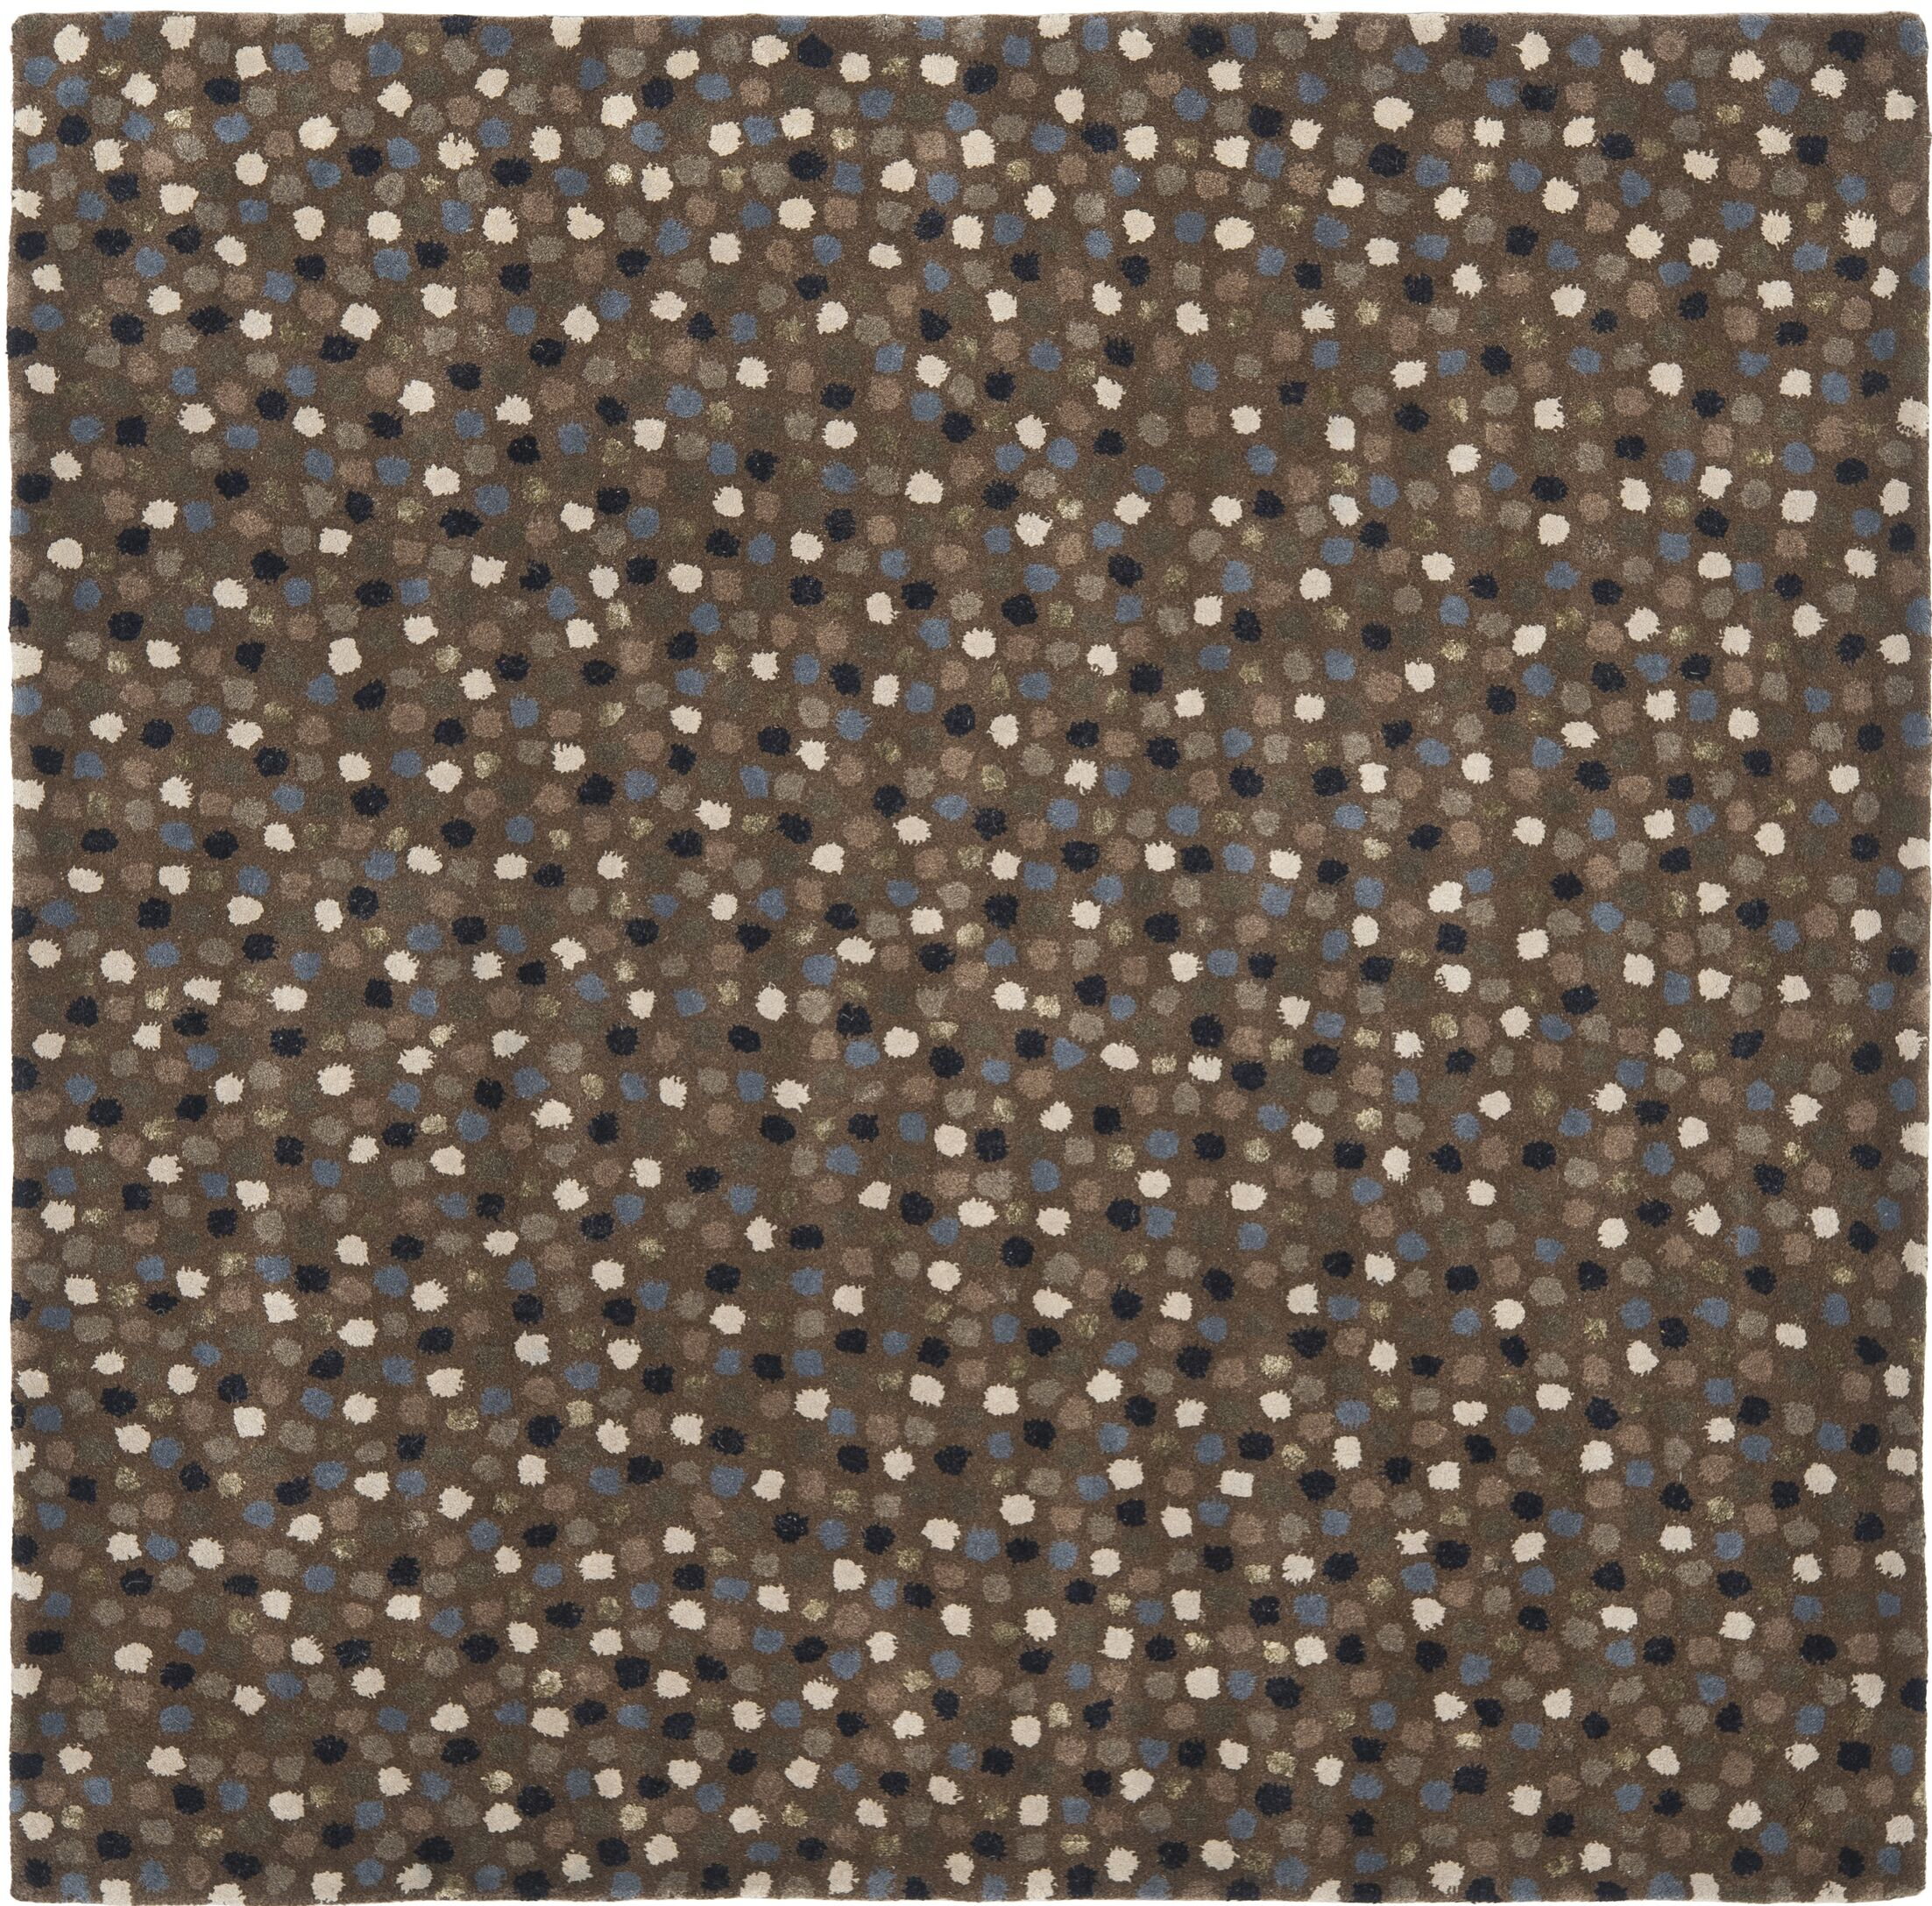 Lockwood Dark Grey Area Rug Rug Size: Square 6'